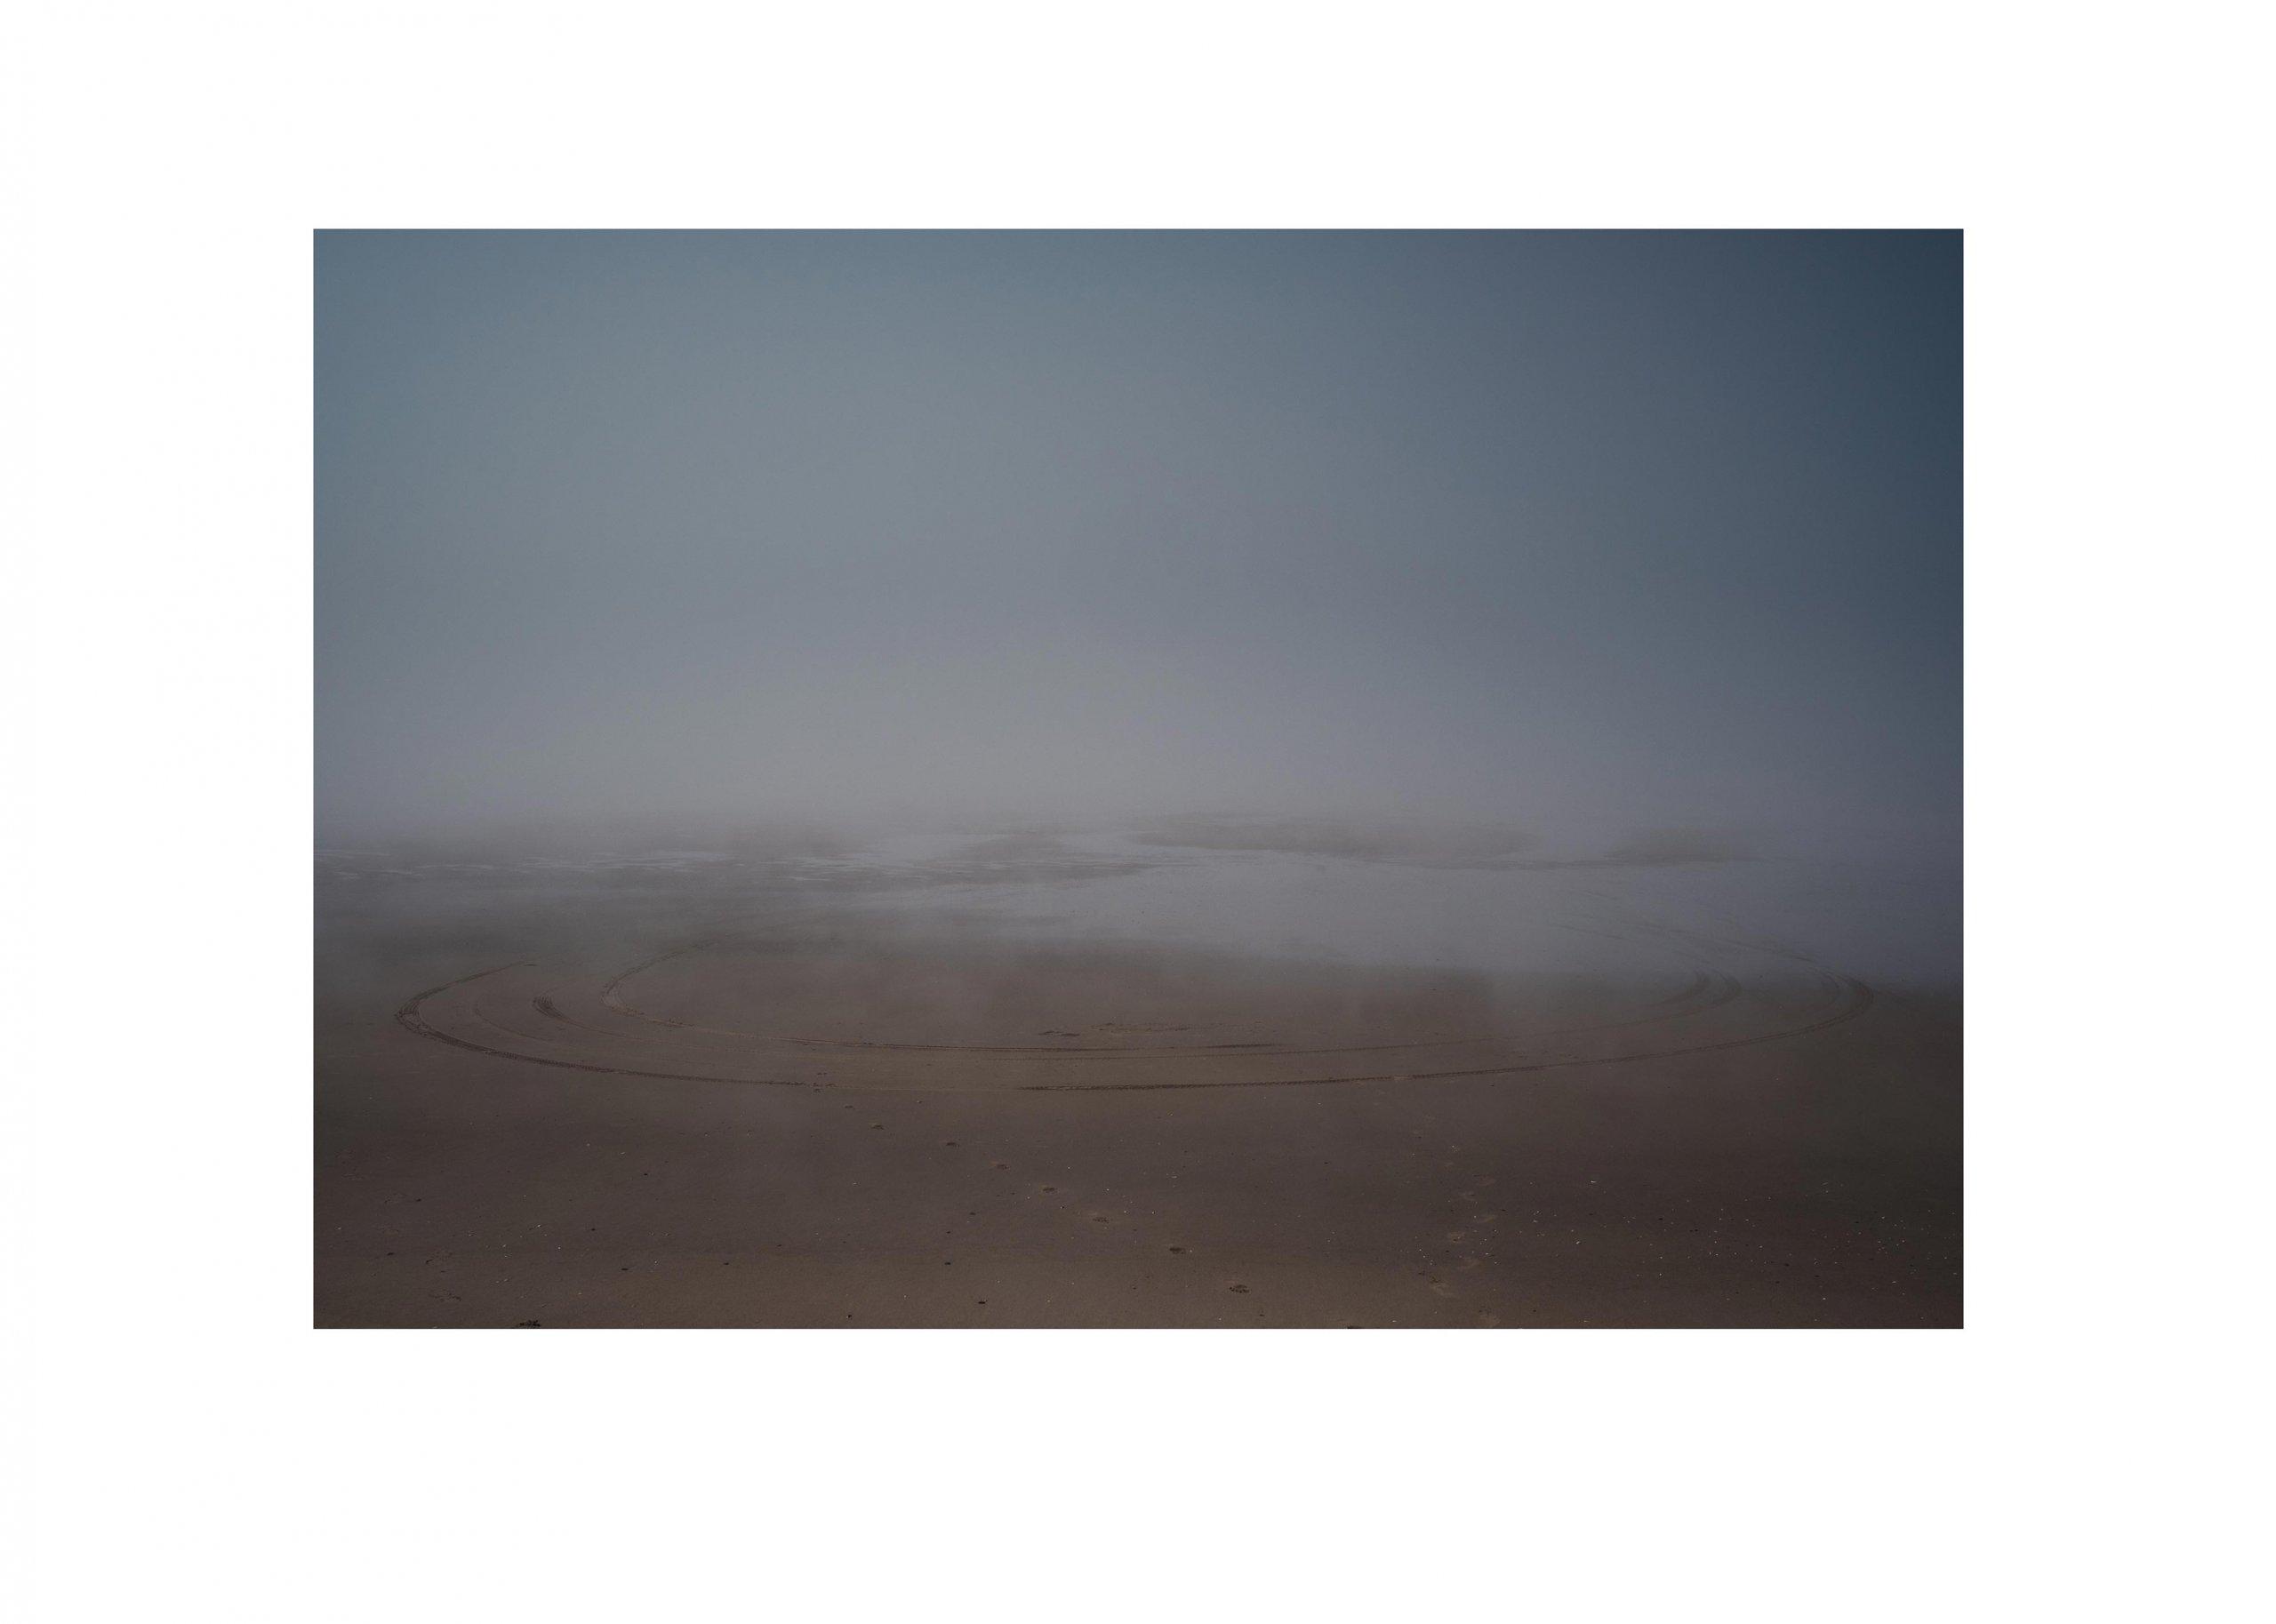 Shifting-Sands-2